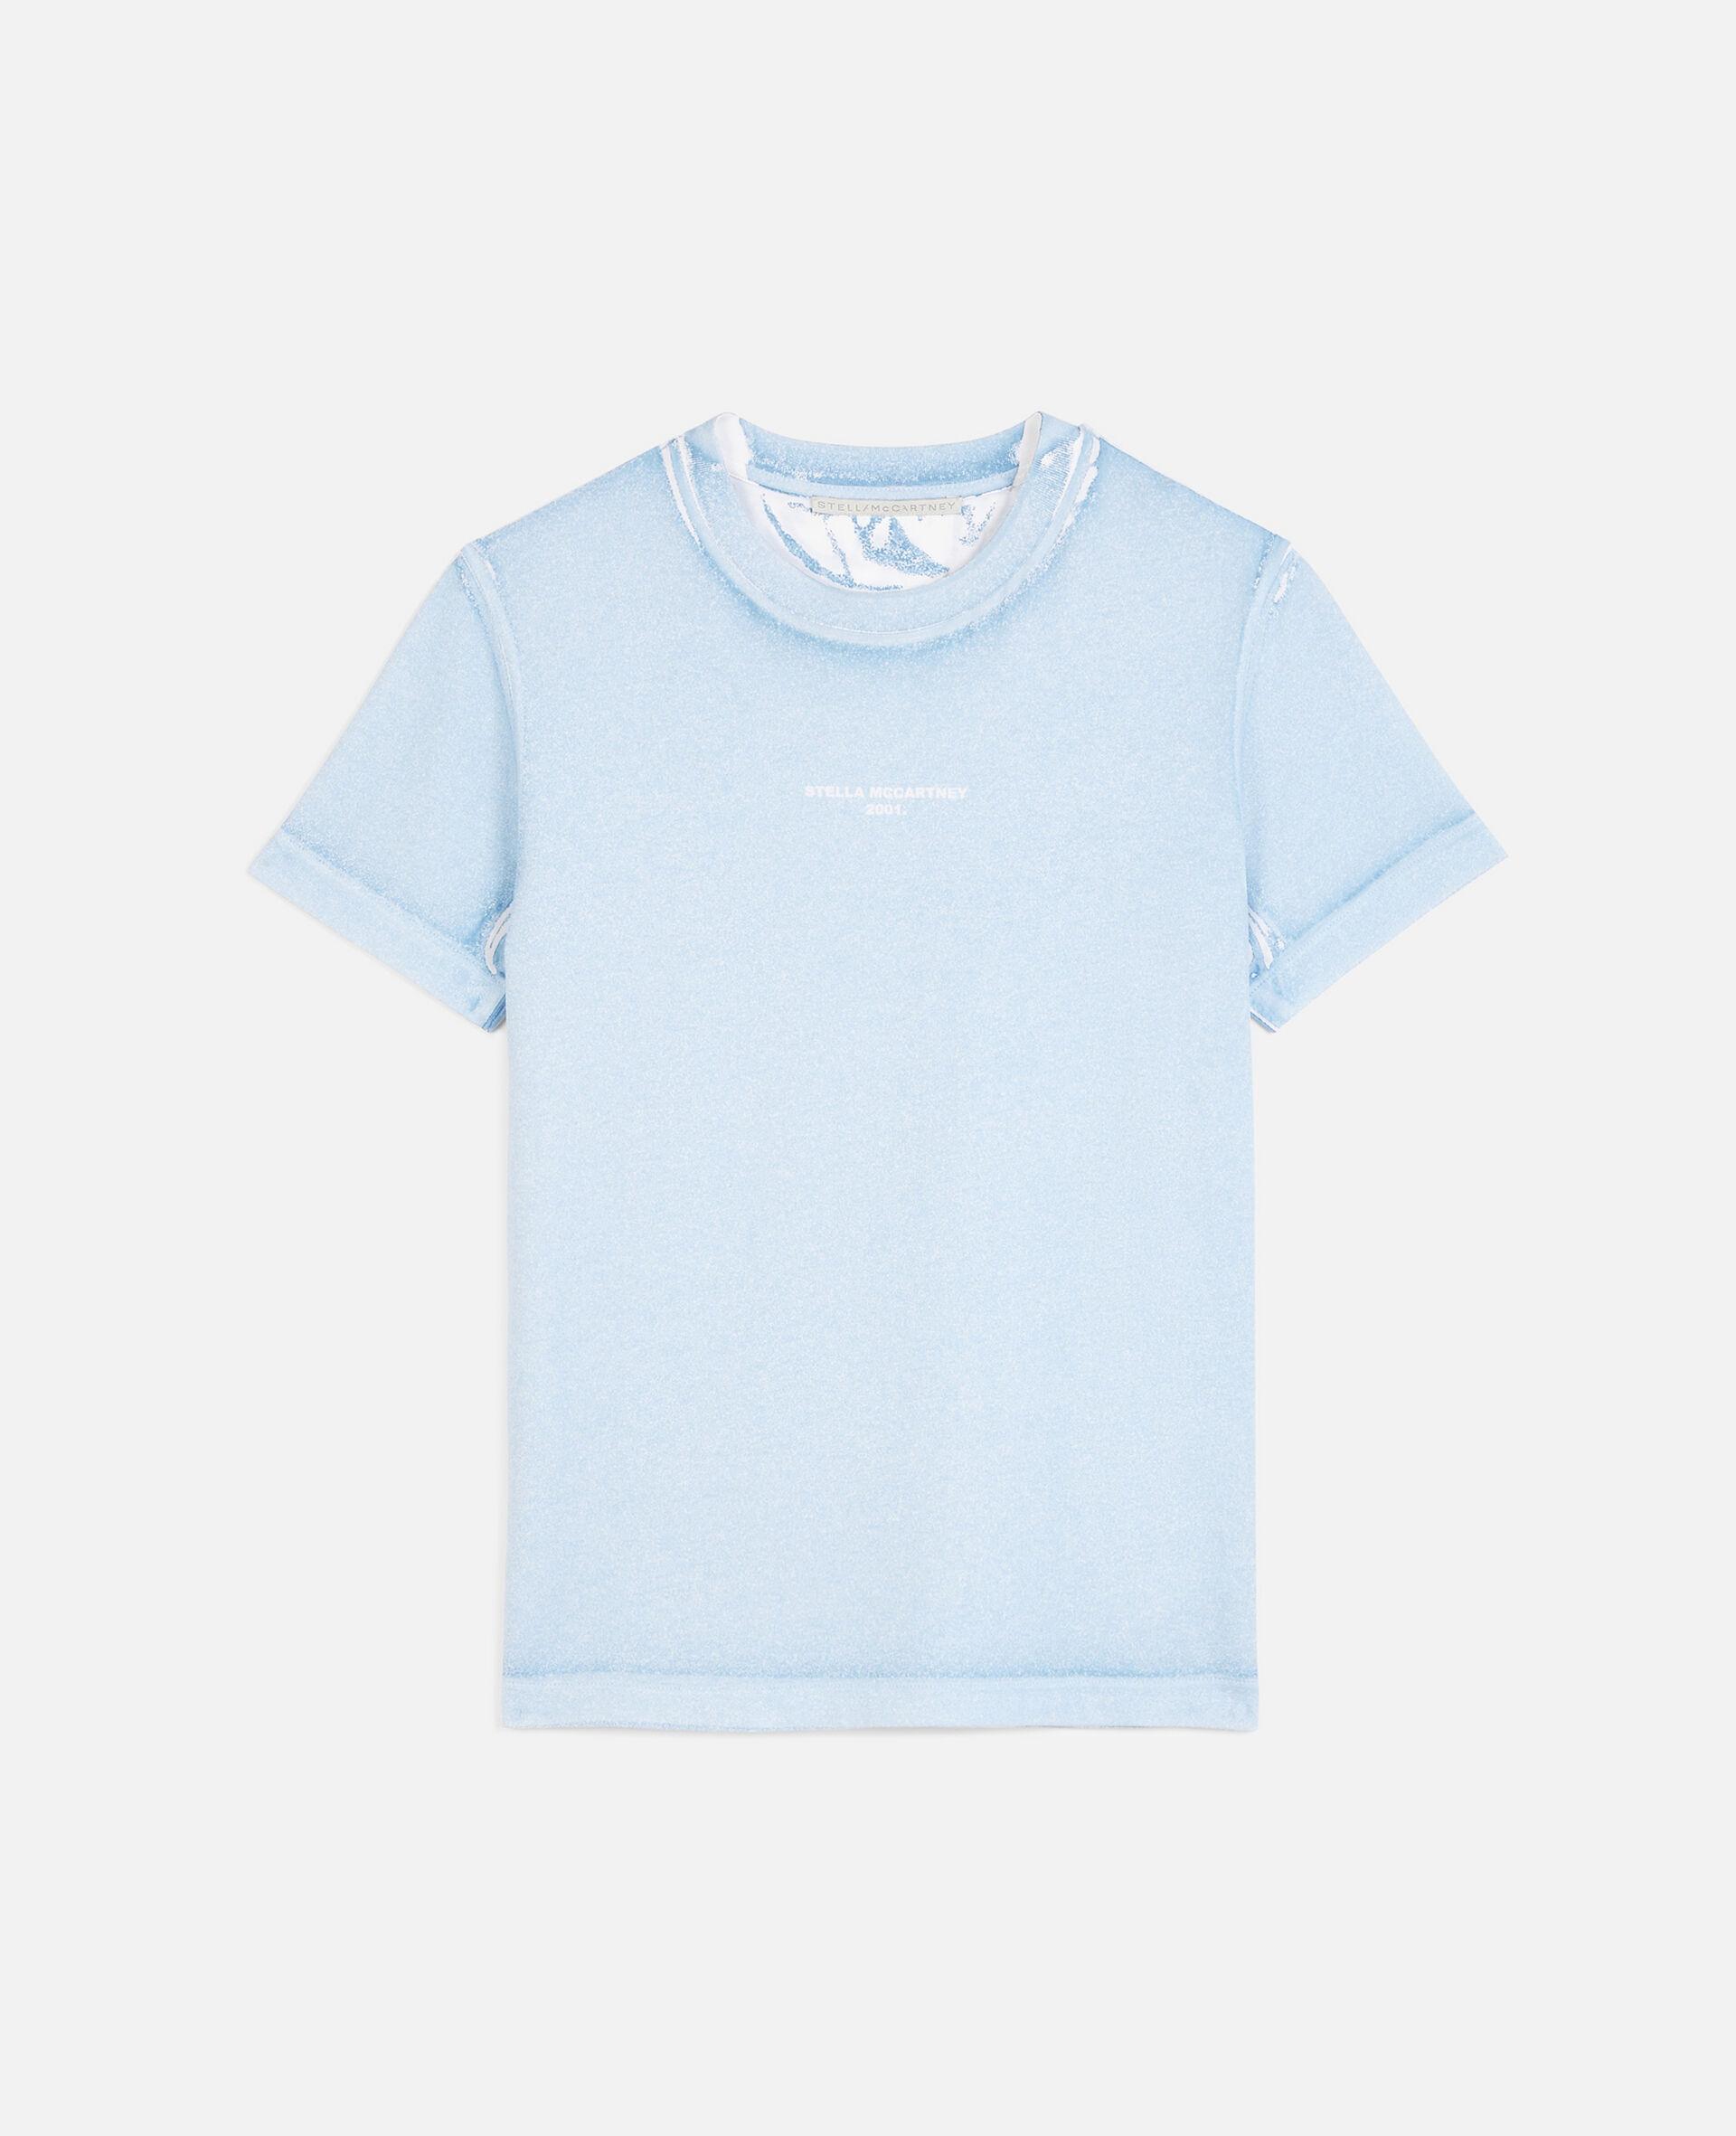 Stella McCartney 2001. T-Shirt-Blau-large image number 0